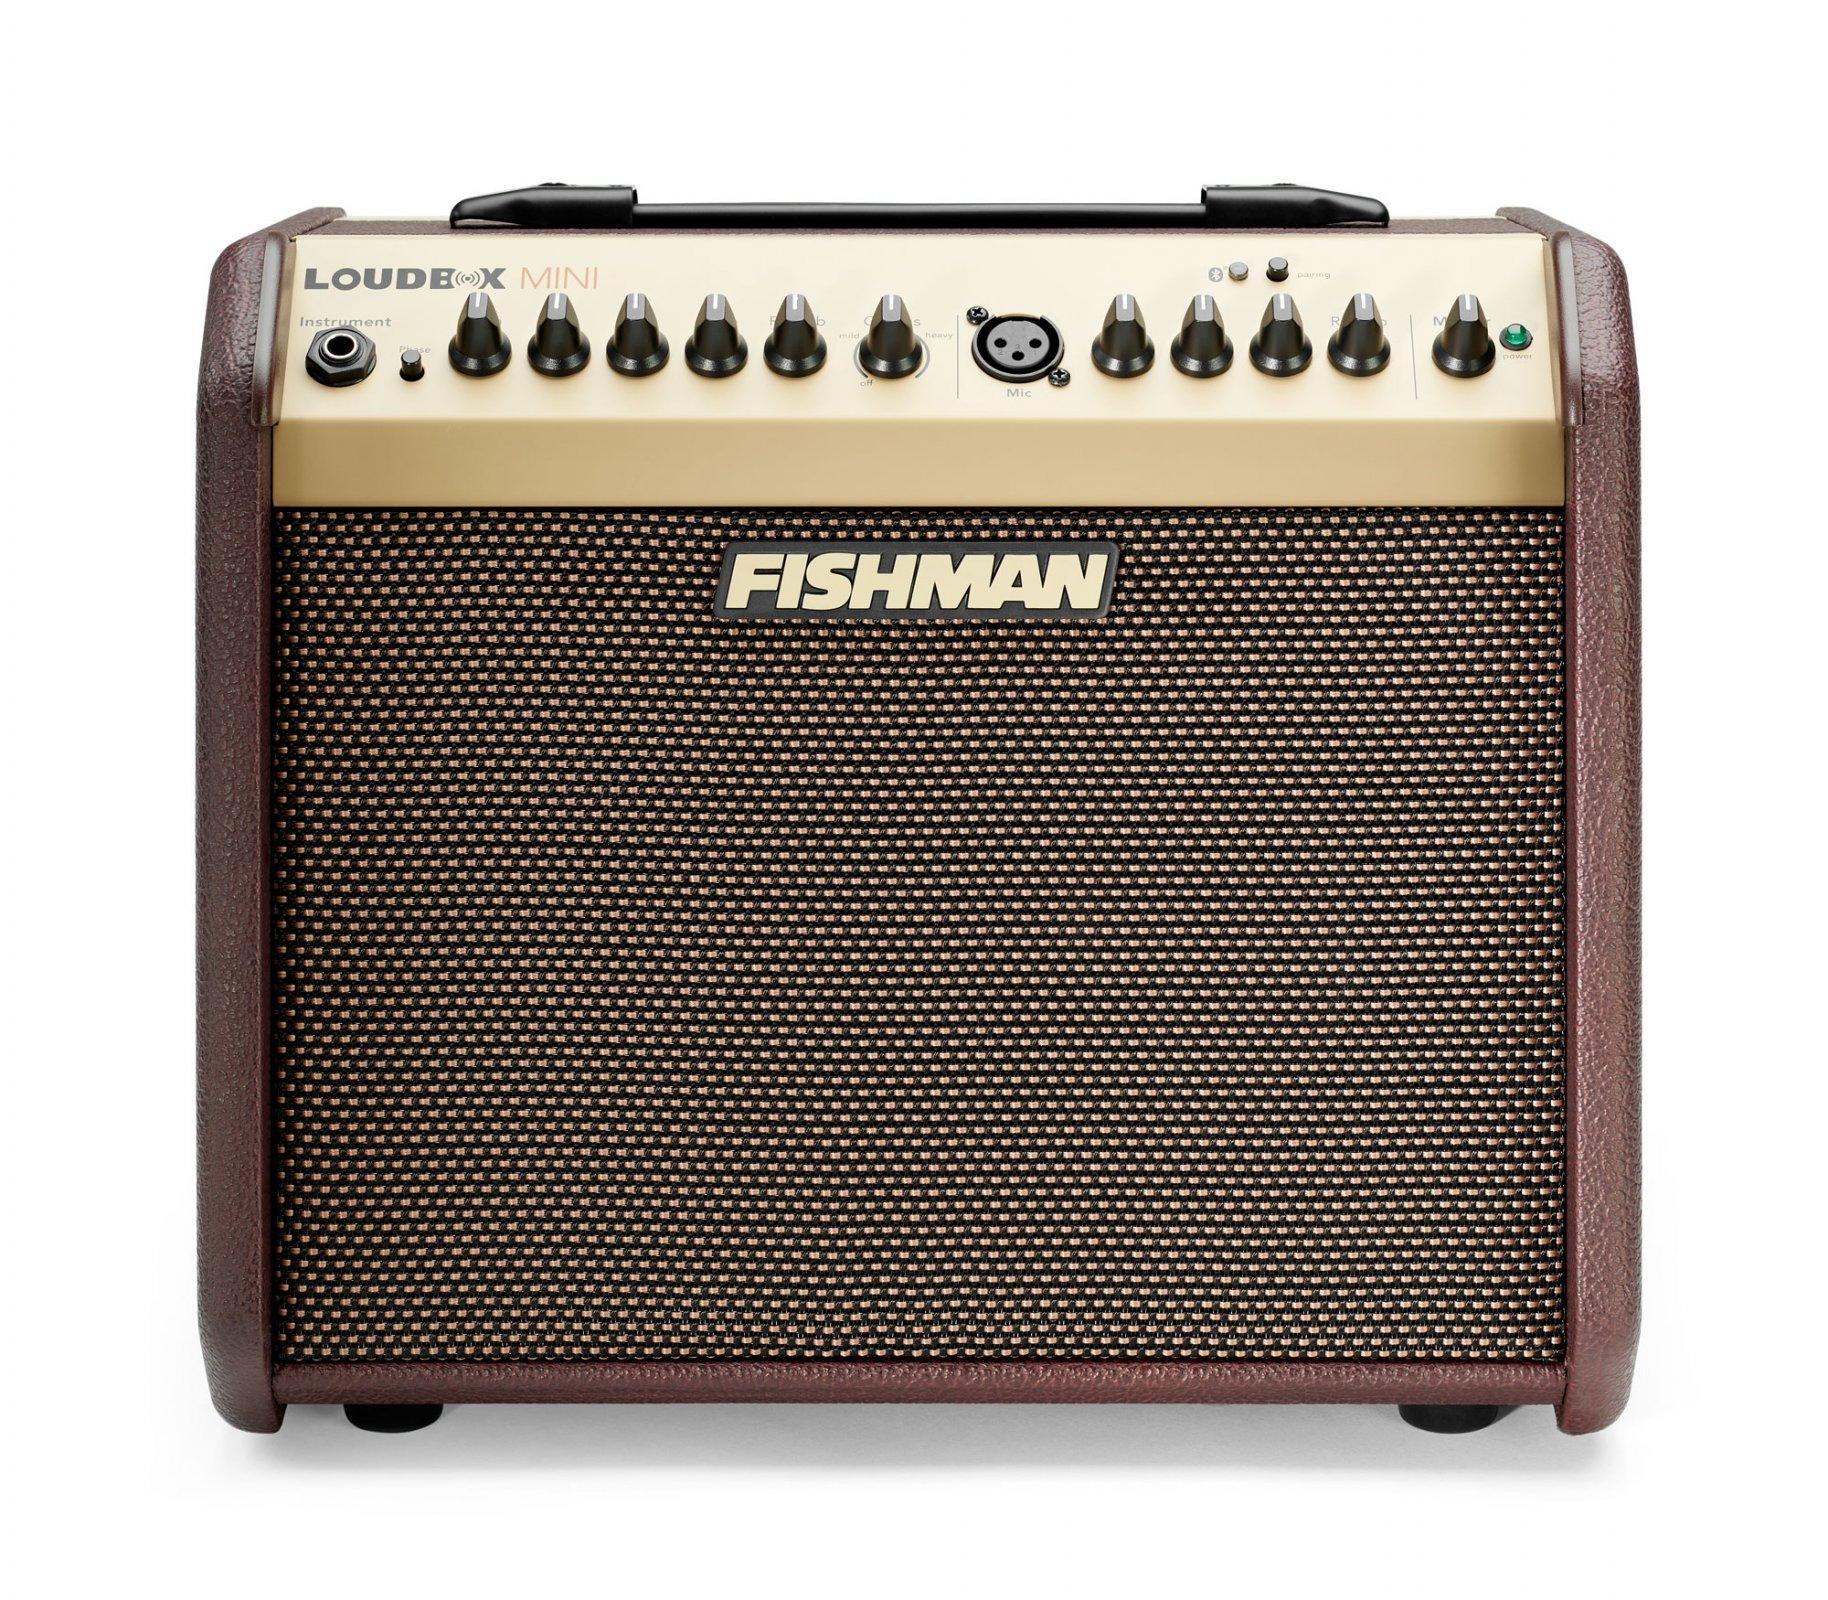 Fishman Loudbox Mini 60 Watt Amplifier - PRO-LBX-500 Without Bluetooth